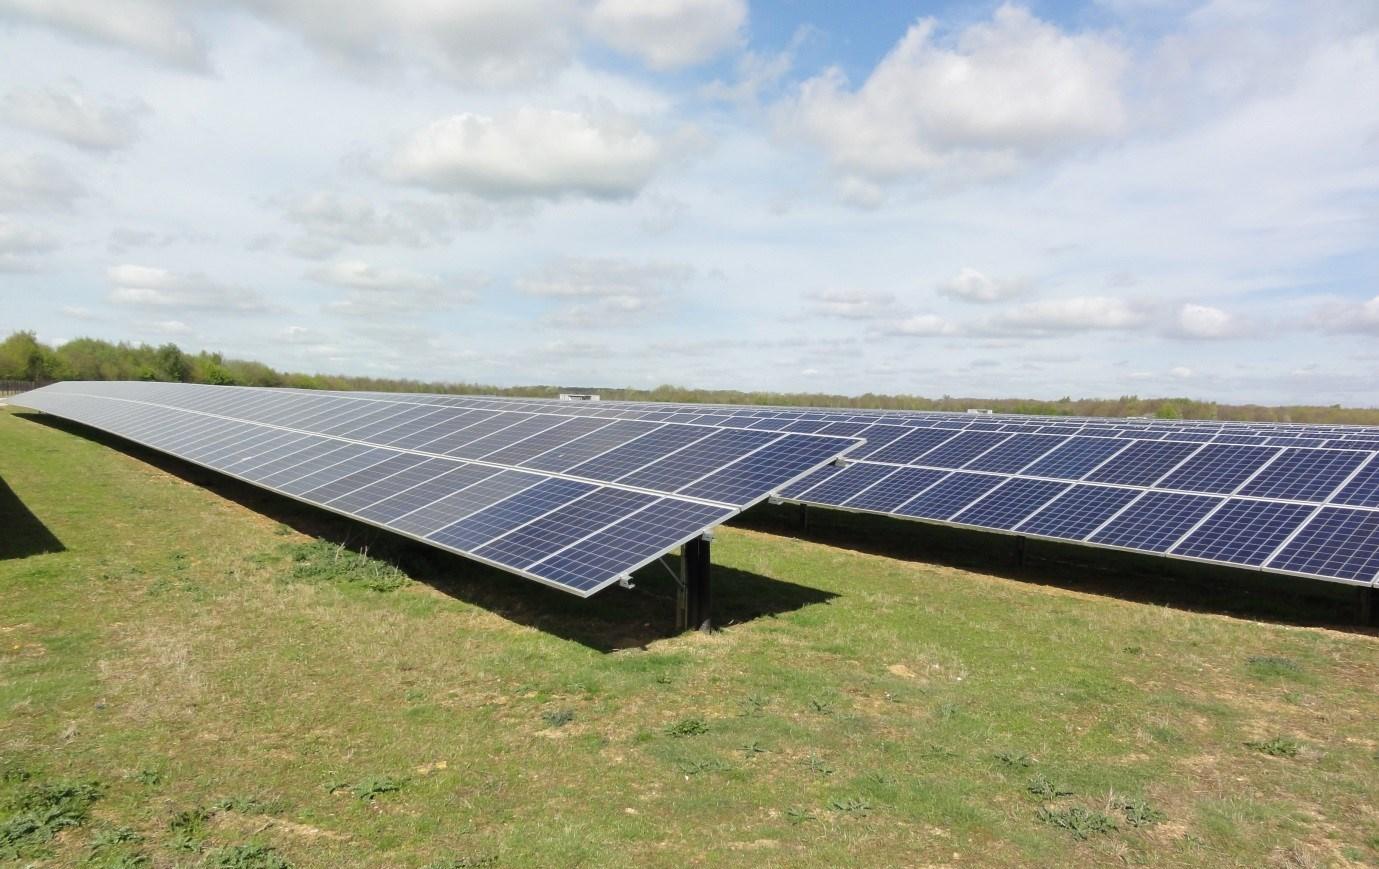 Glint And Glare Assessment Tullamore Solar Farm Roi